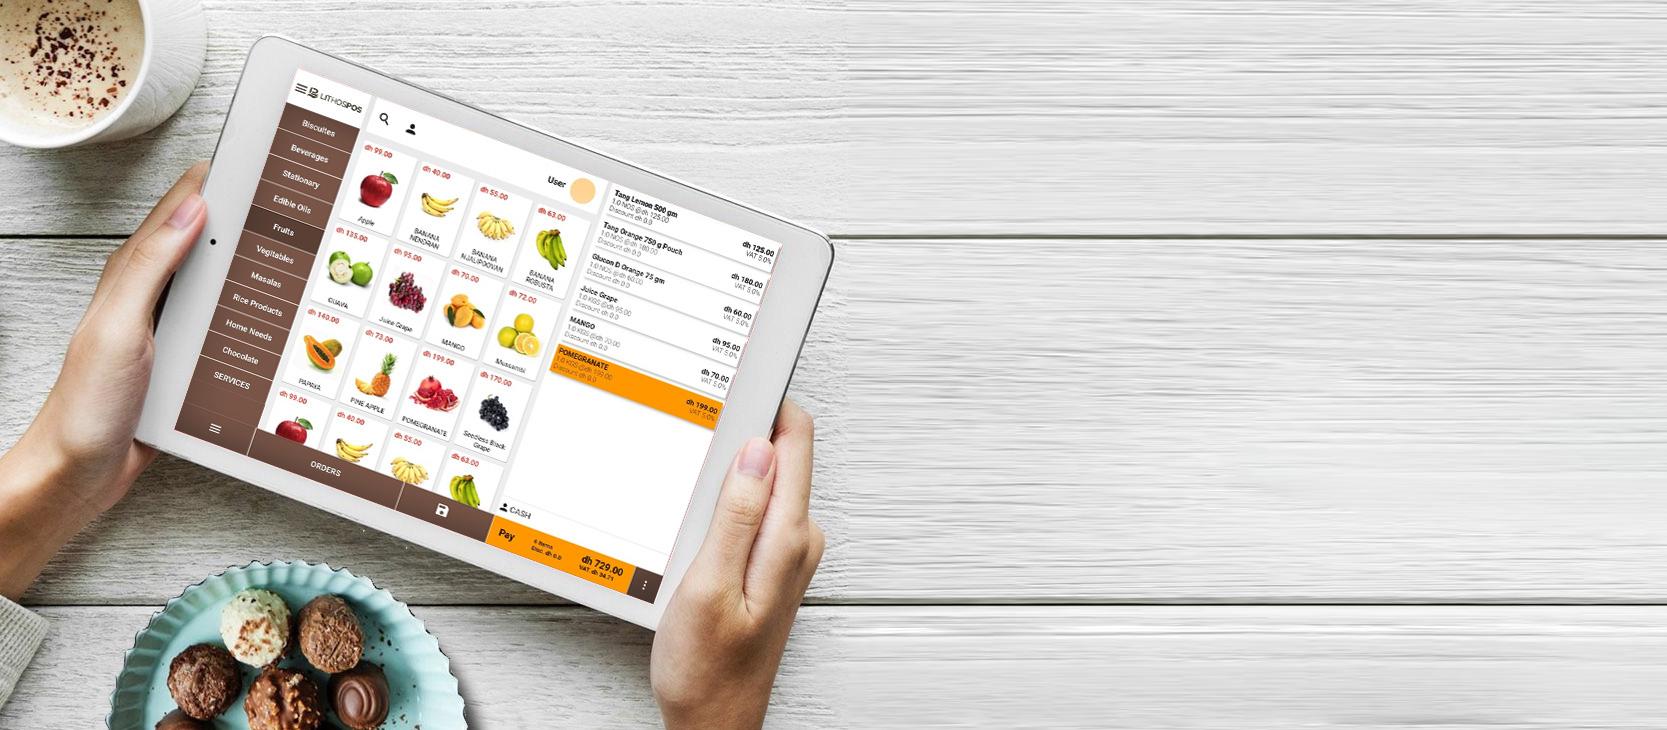 lithos pos app for ipad